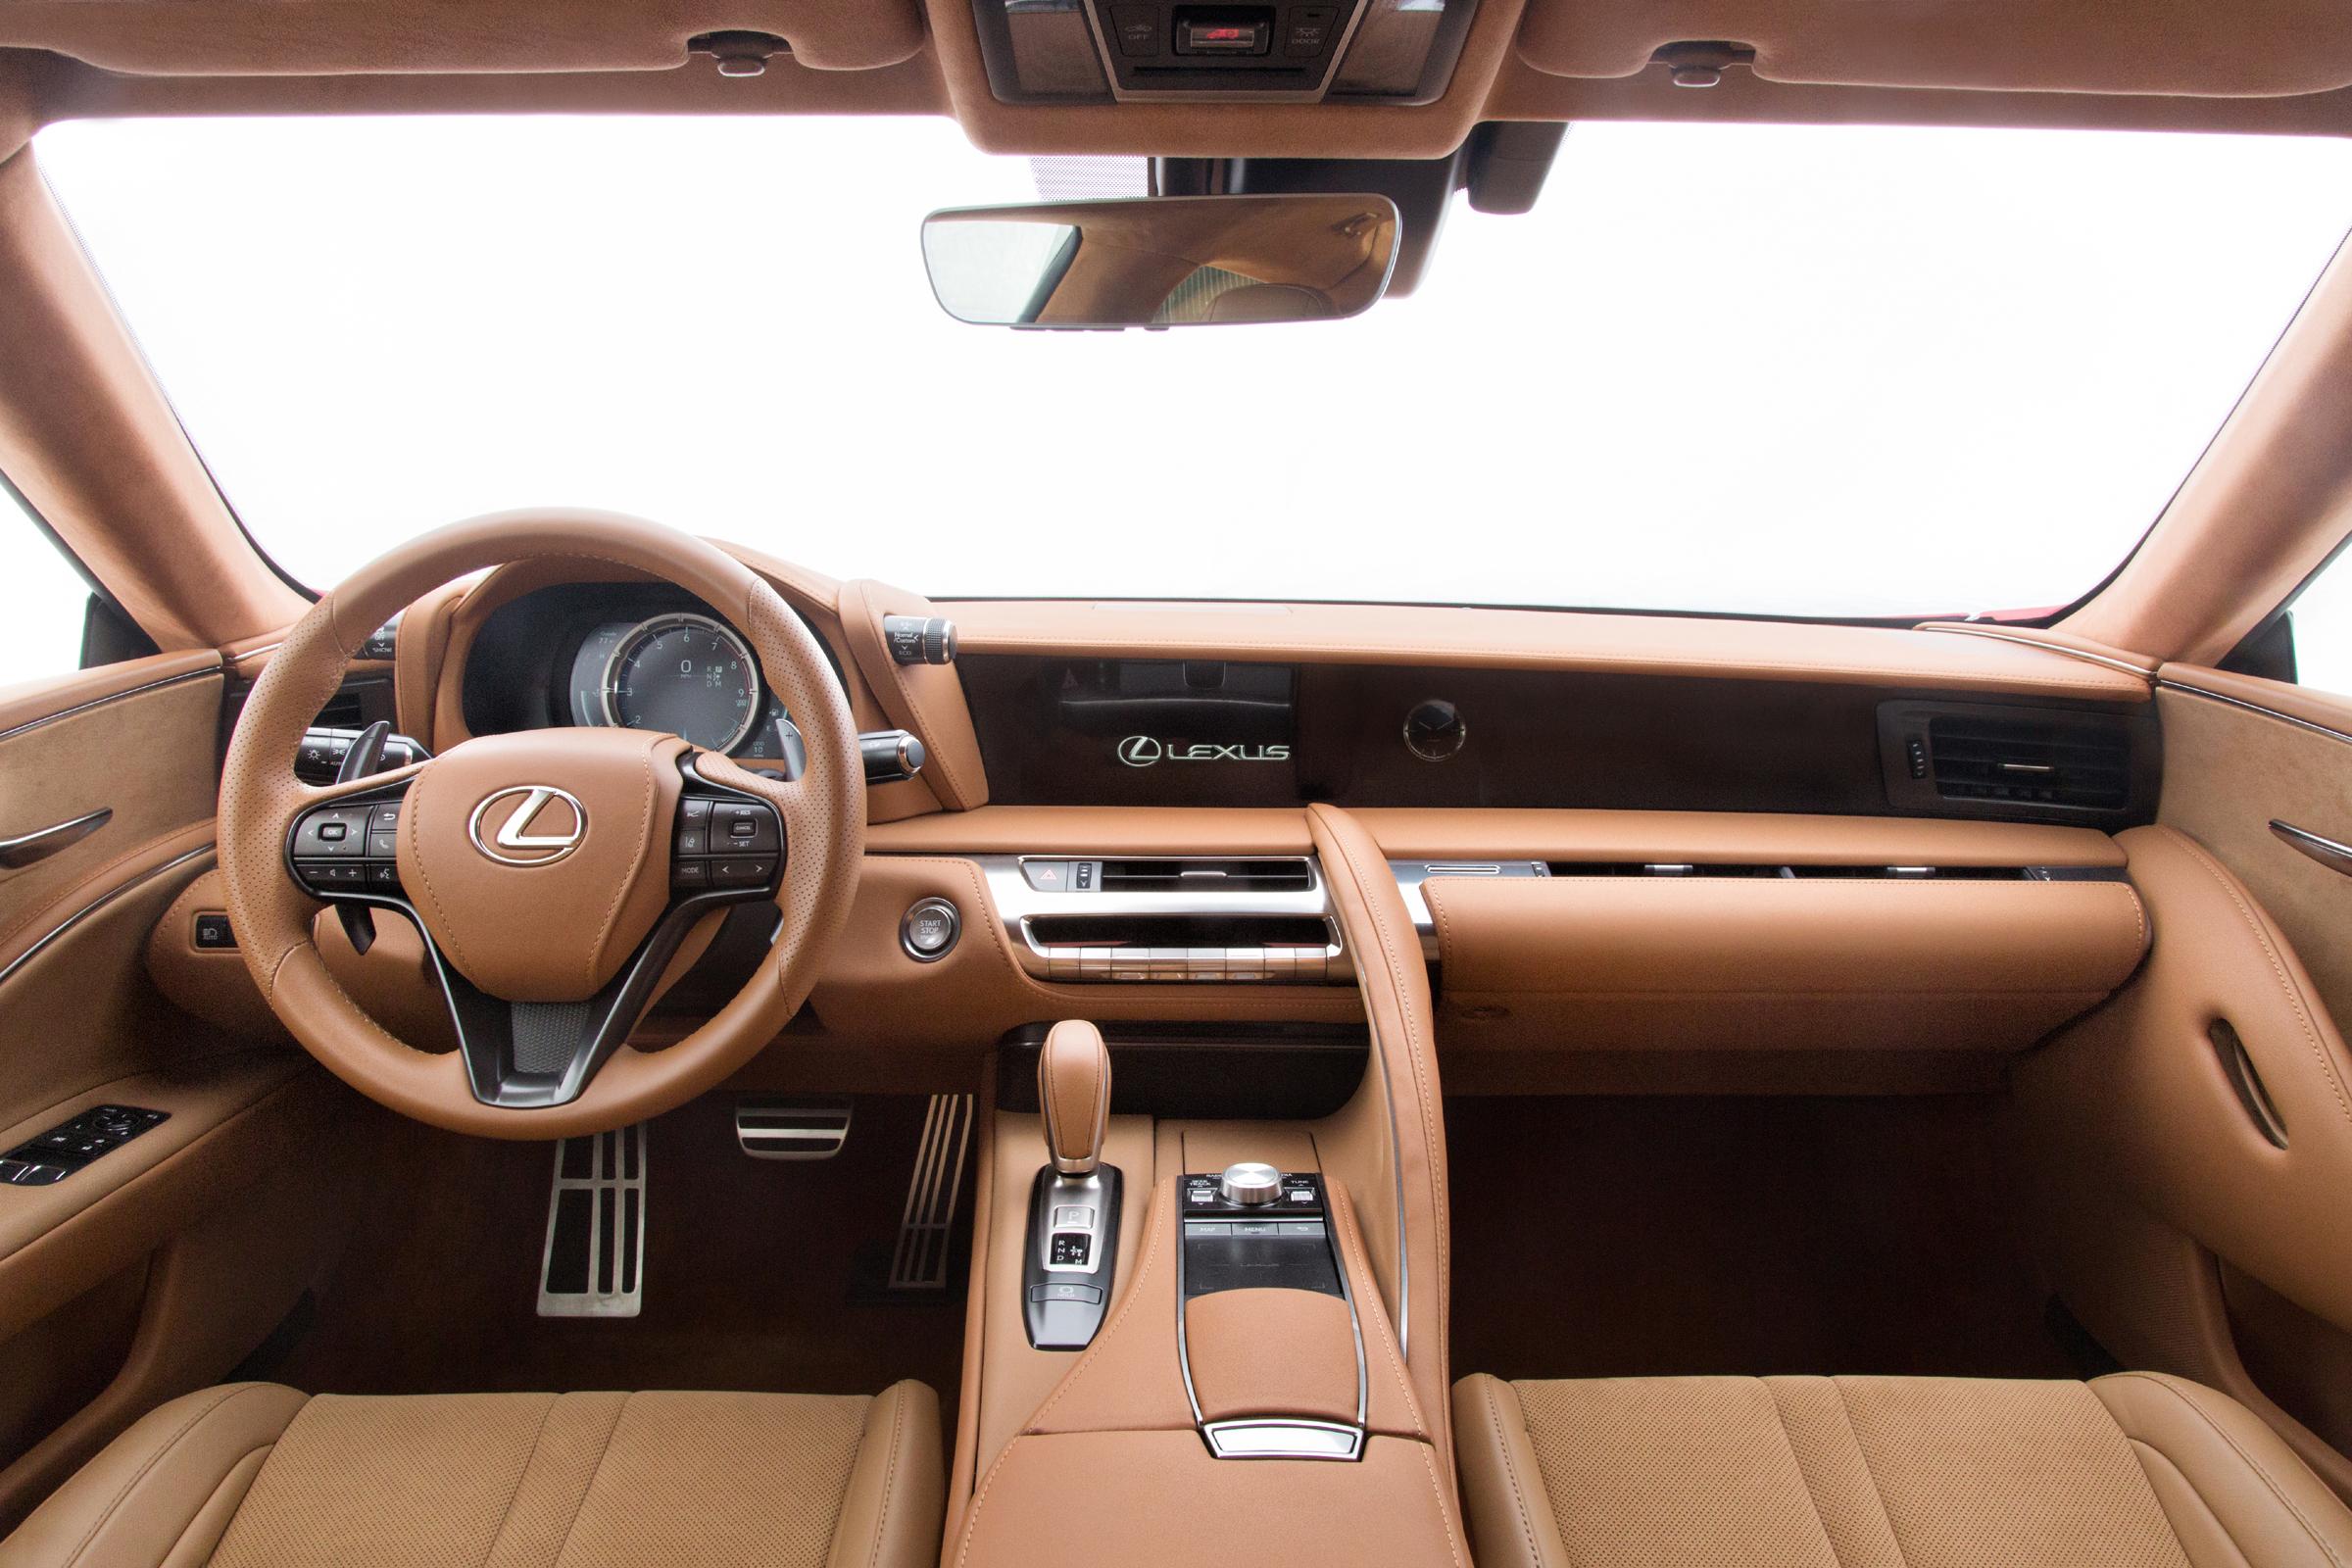 Lexus_LC_500_001_BB74131E8F47AC977ECD592DA05B448D1C339096